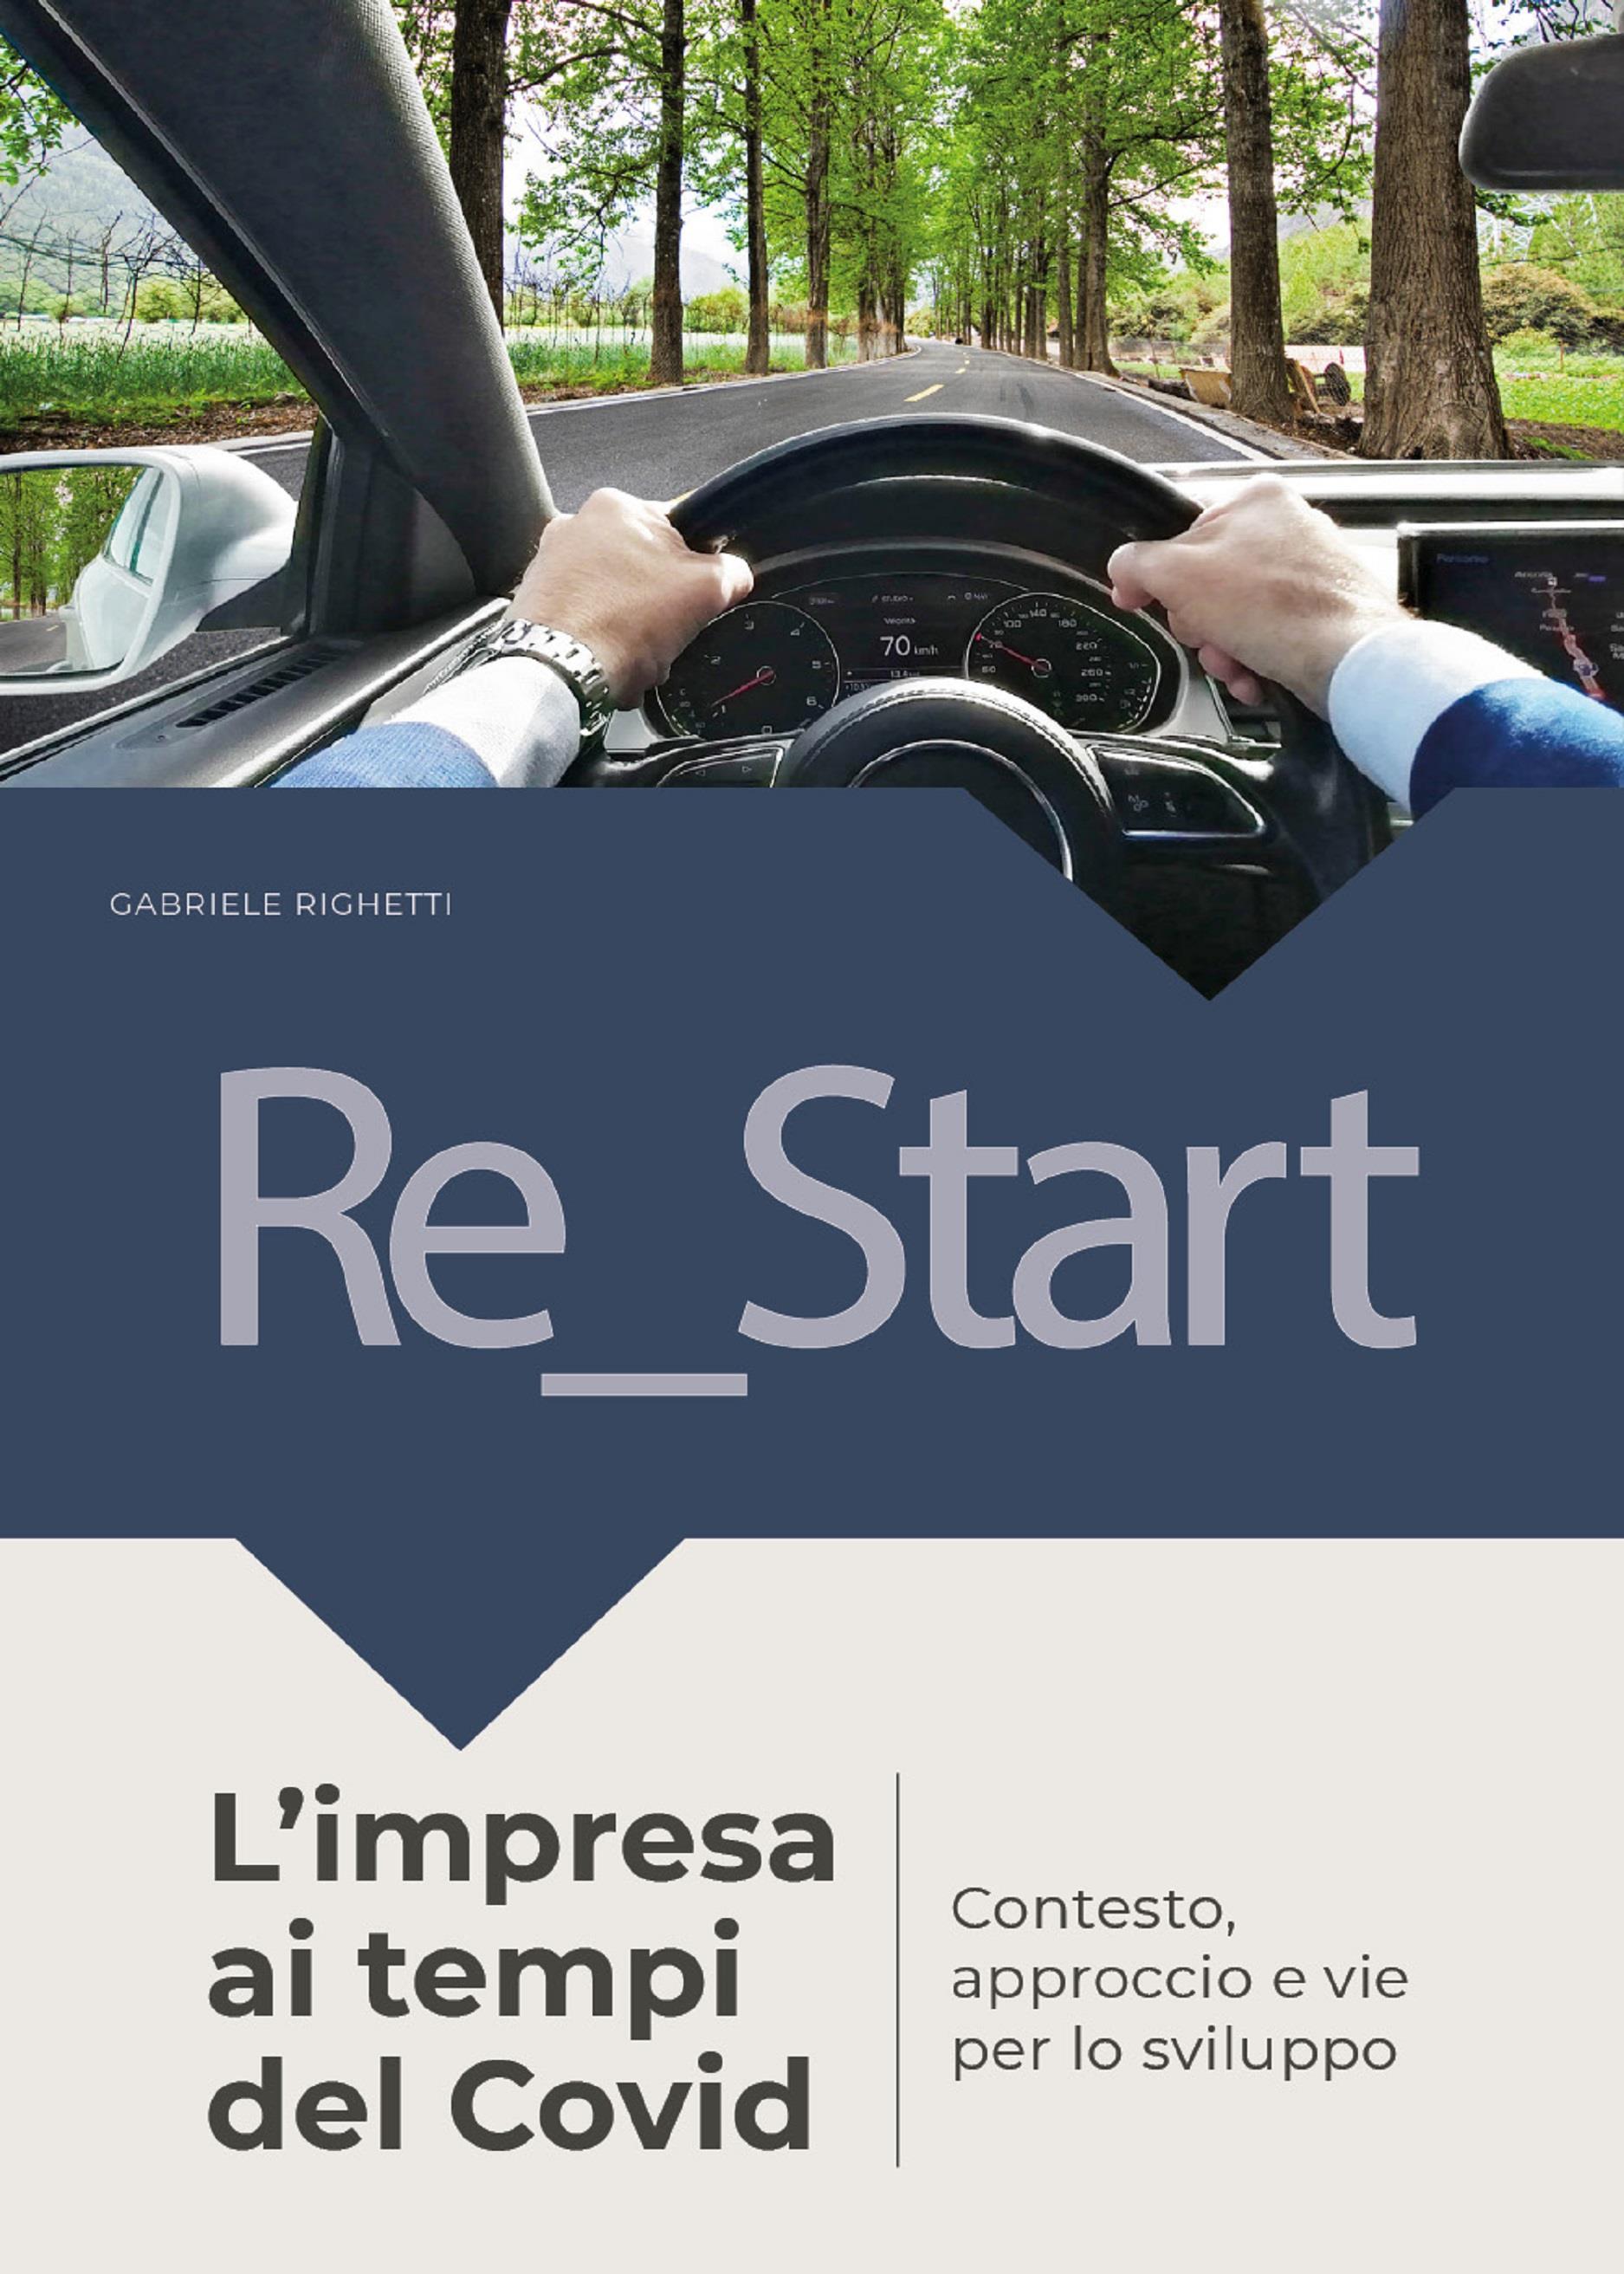 Re_Start – L'impresa ai tempi del Covid